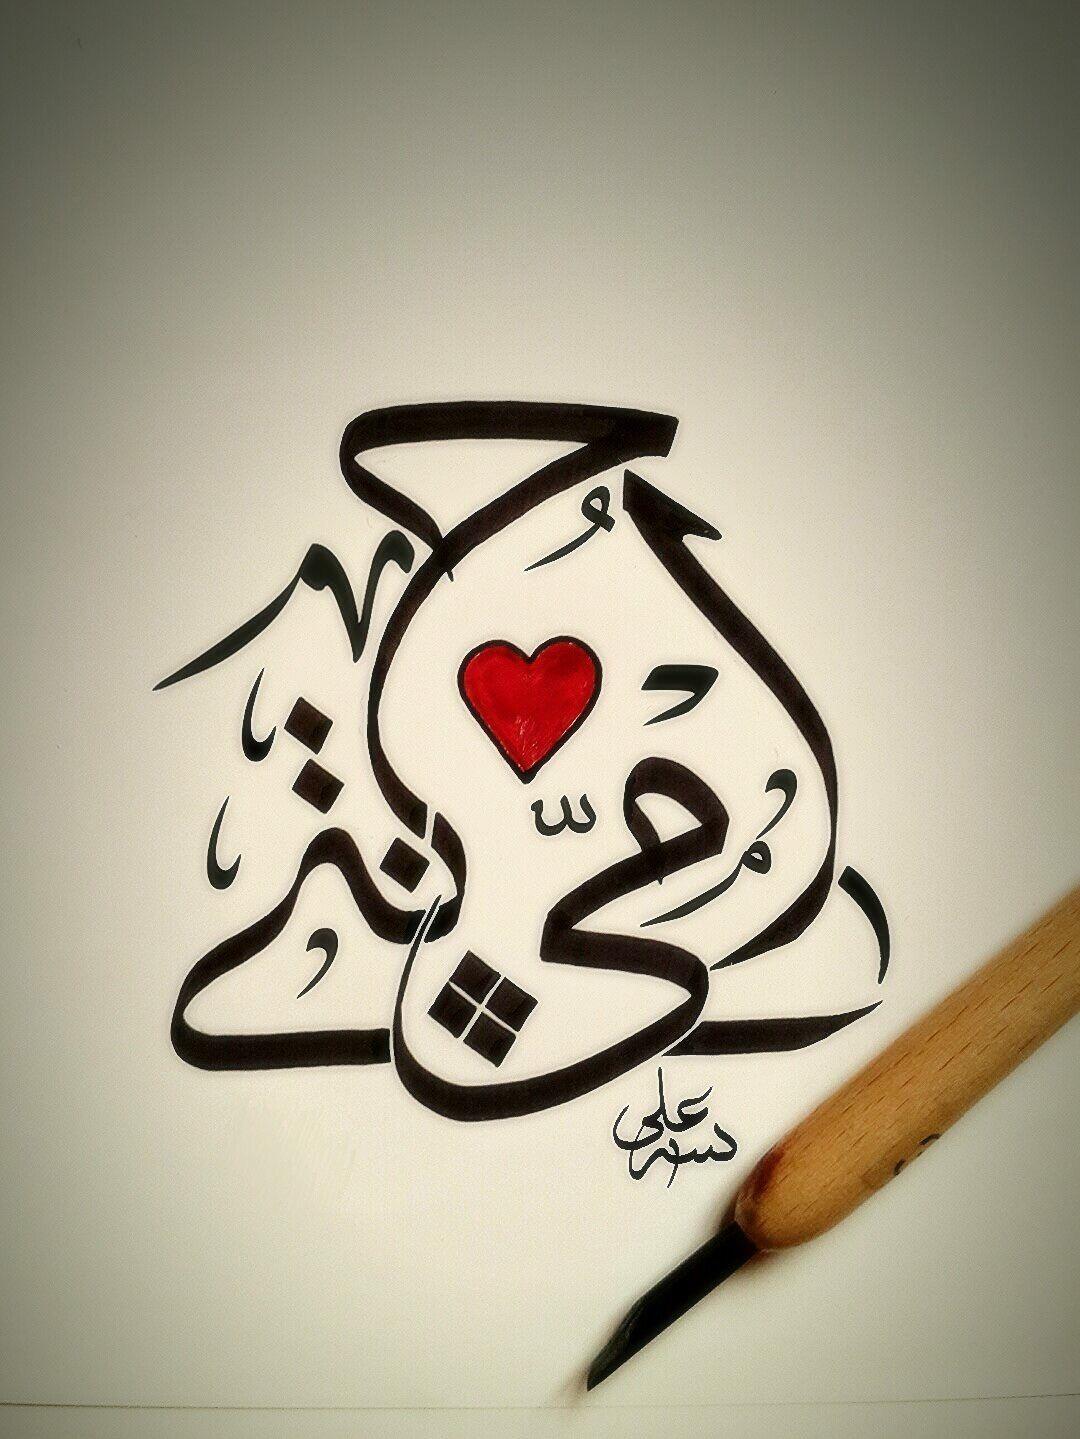 أمي جنتي خط عربي علي نجم Islamic Art Calligraphy Islamic Art Arabic Calligraphy